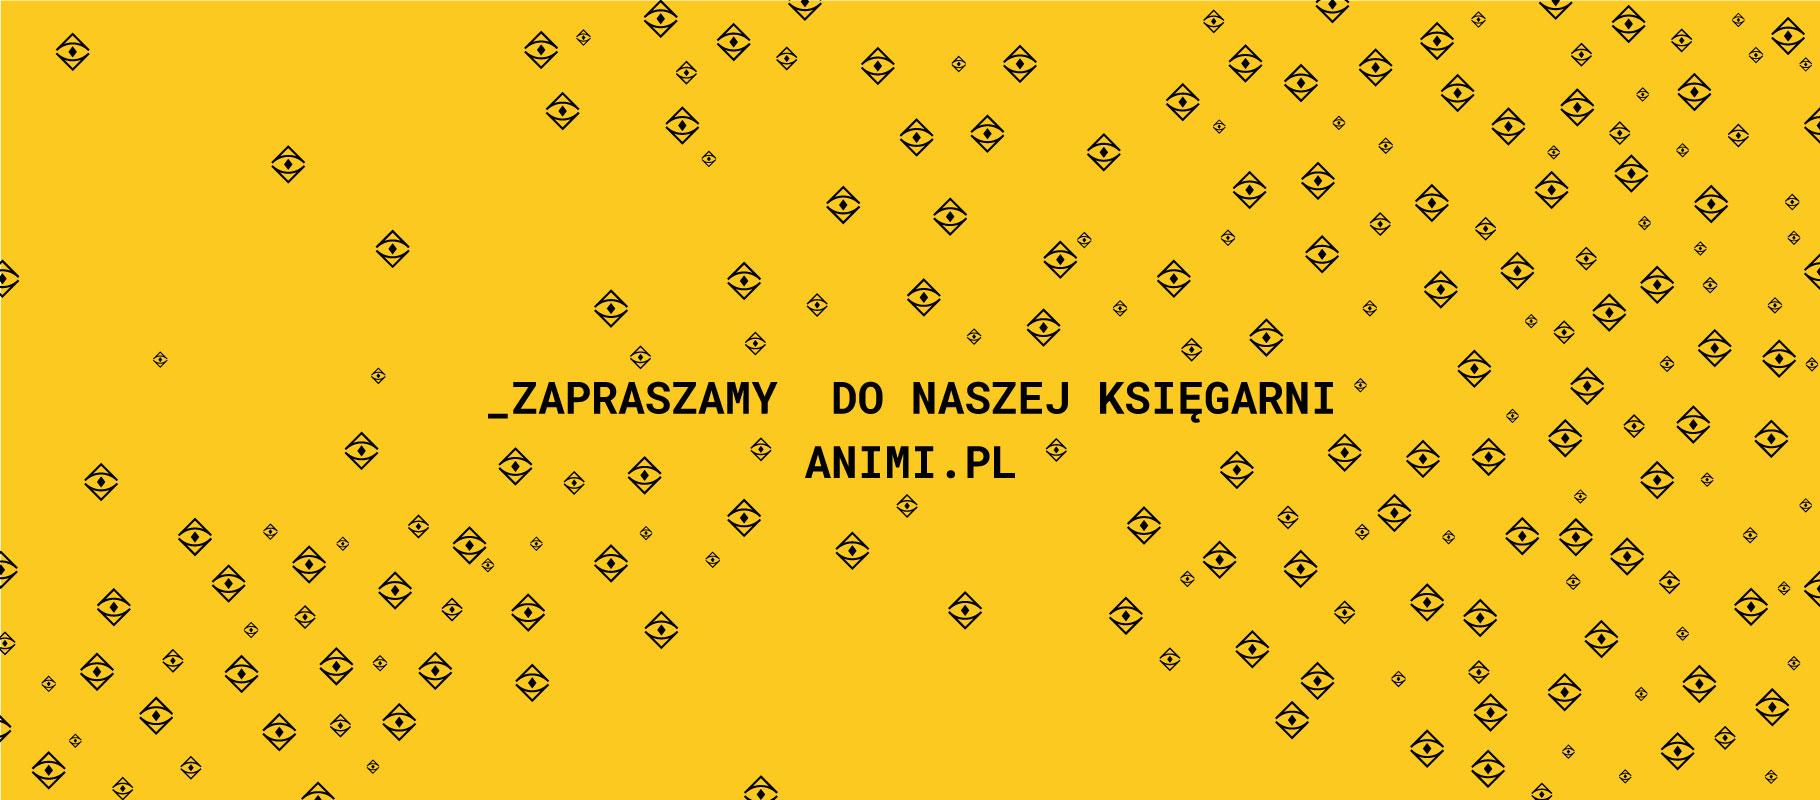 ANIMI.PL